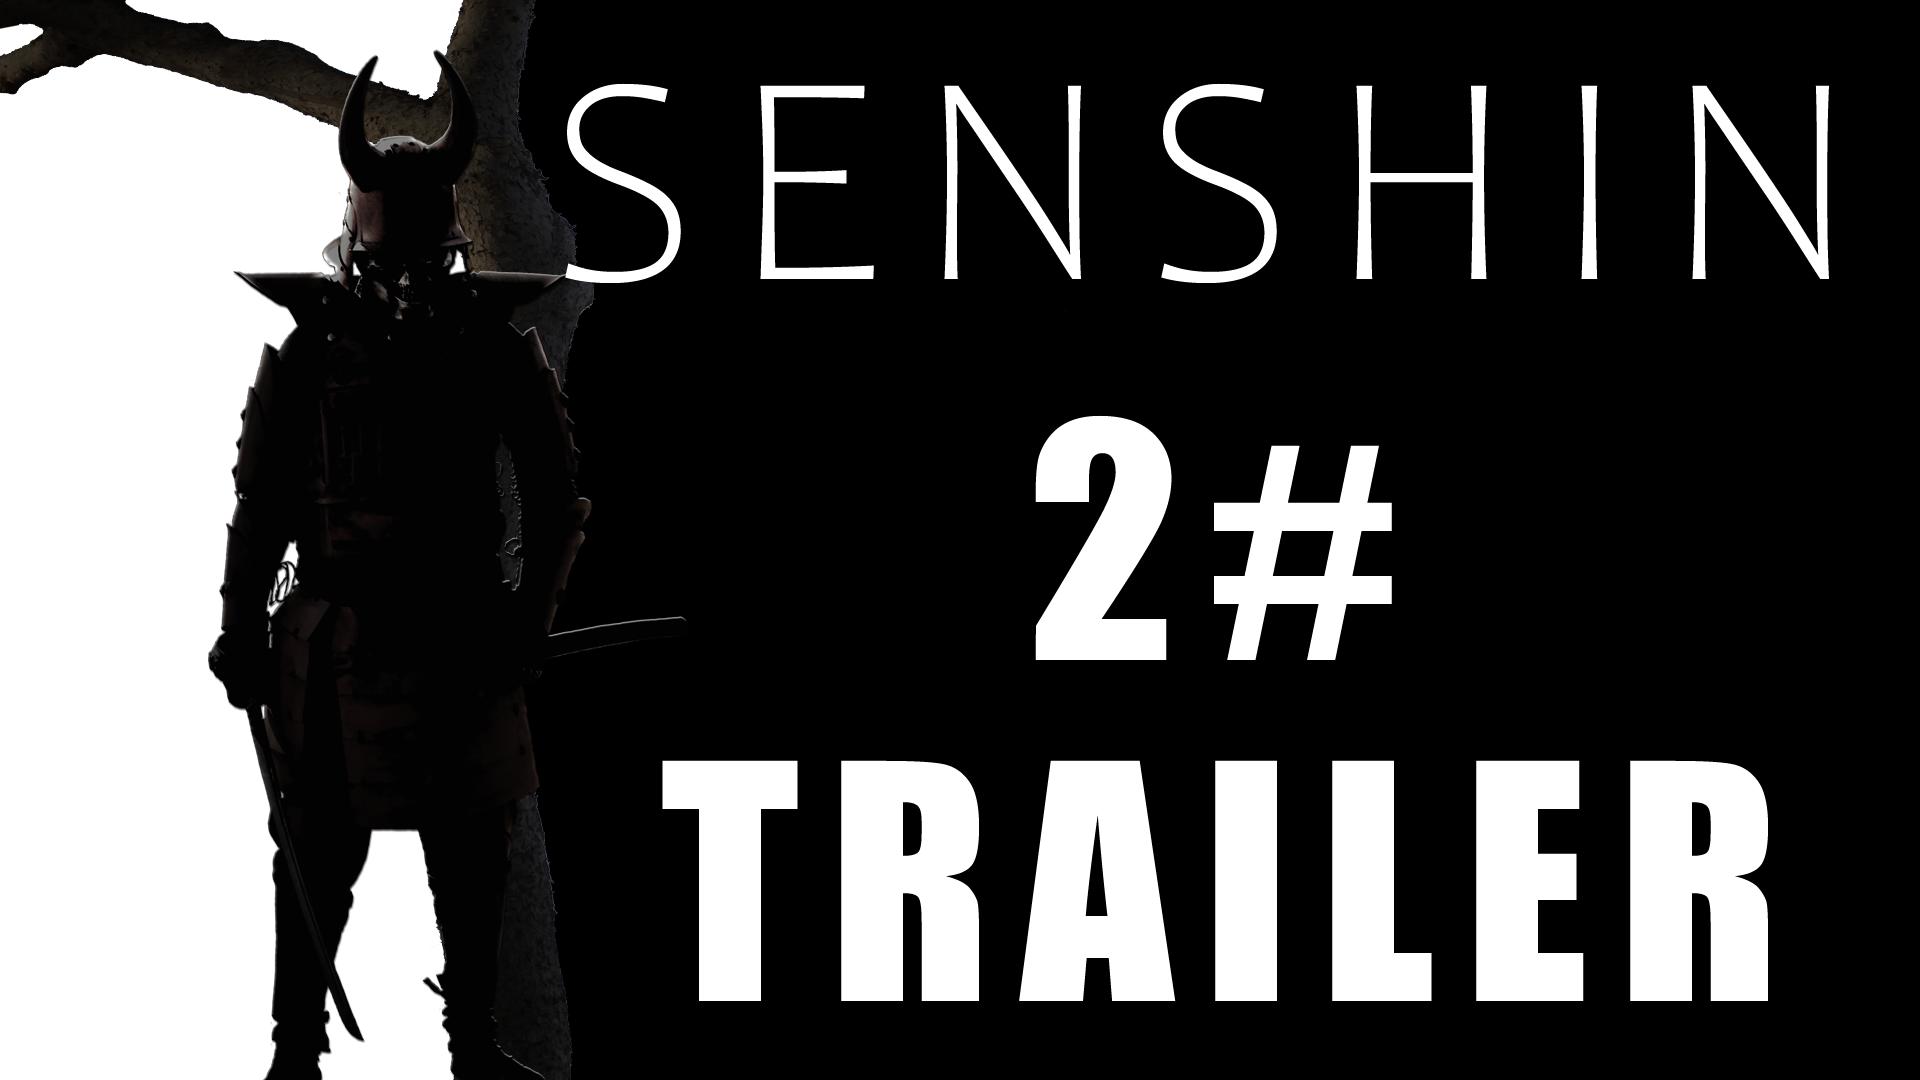 portada youtube trailer senshin2